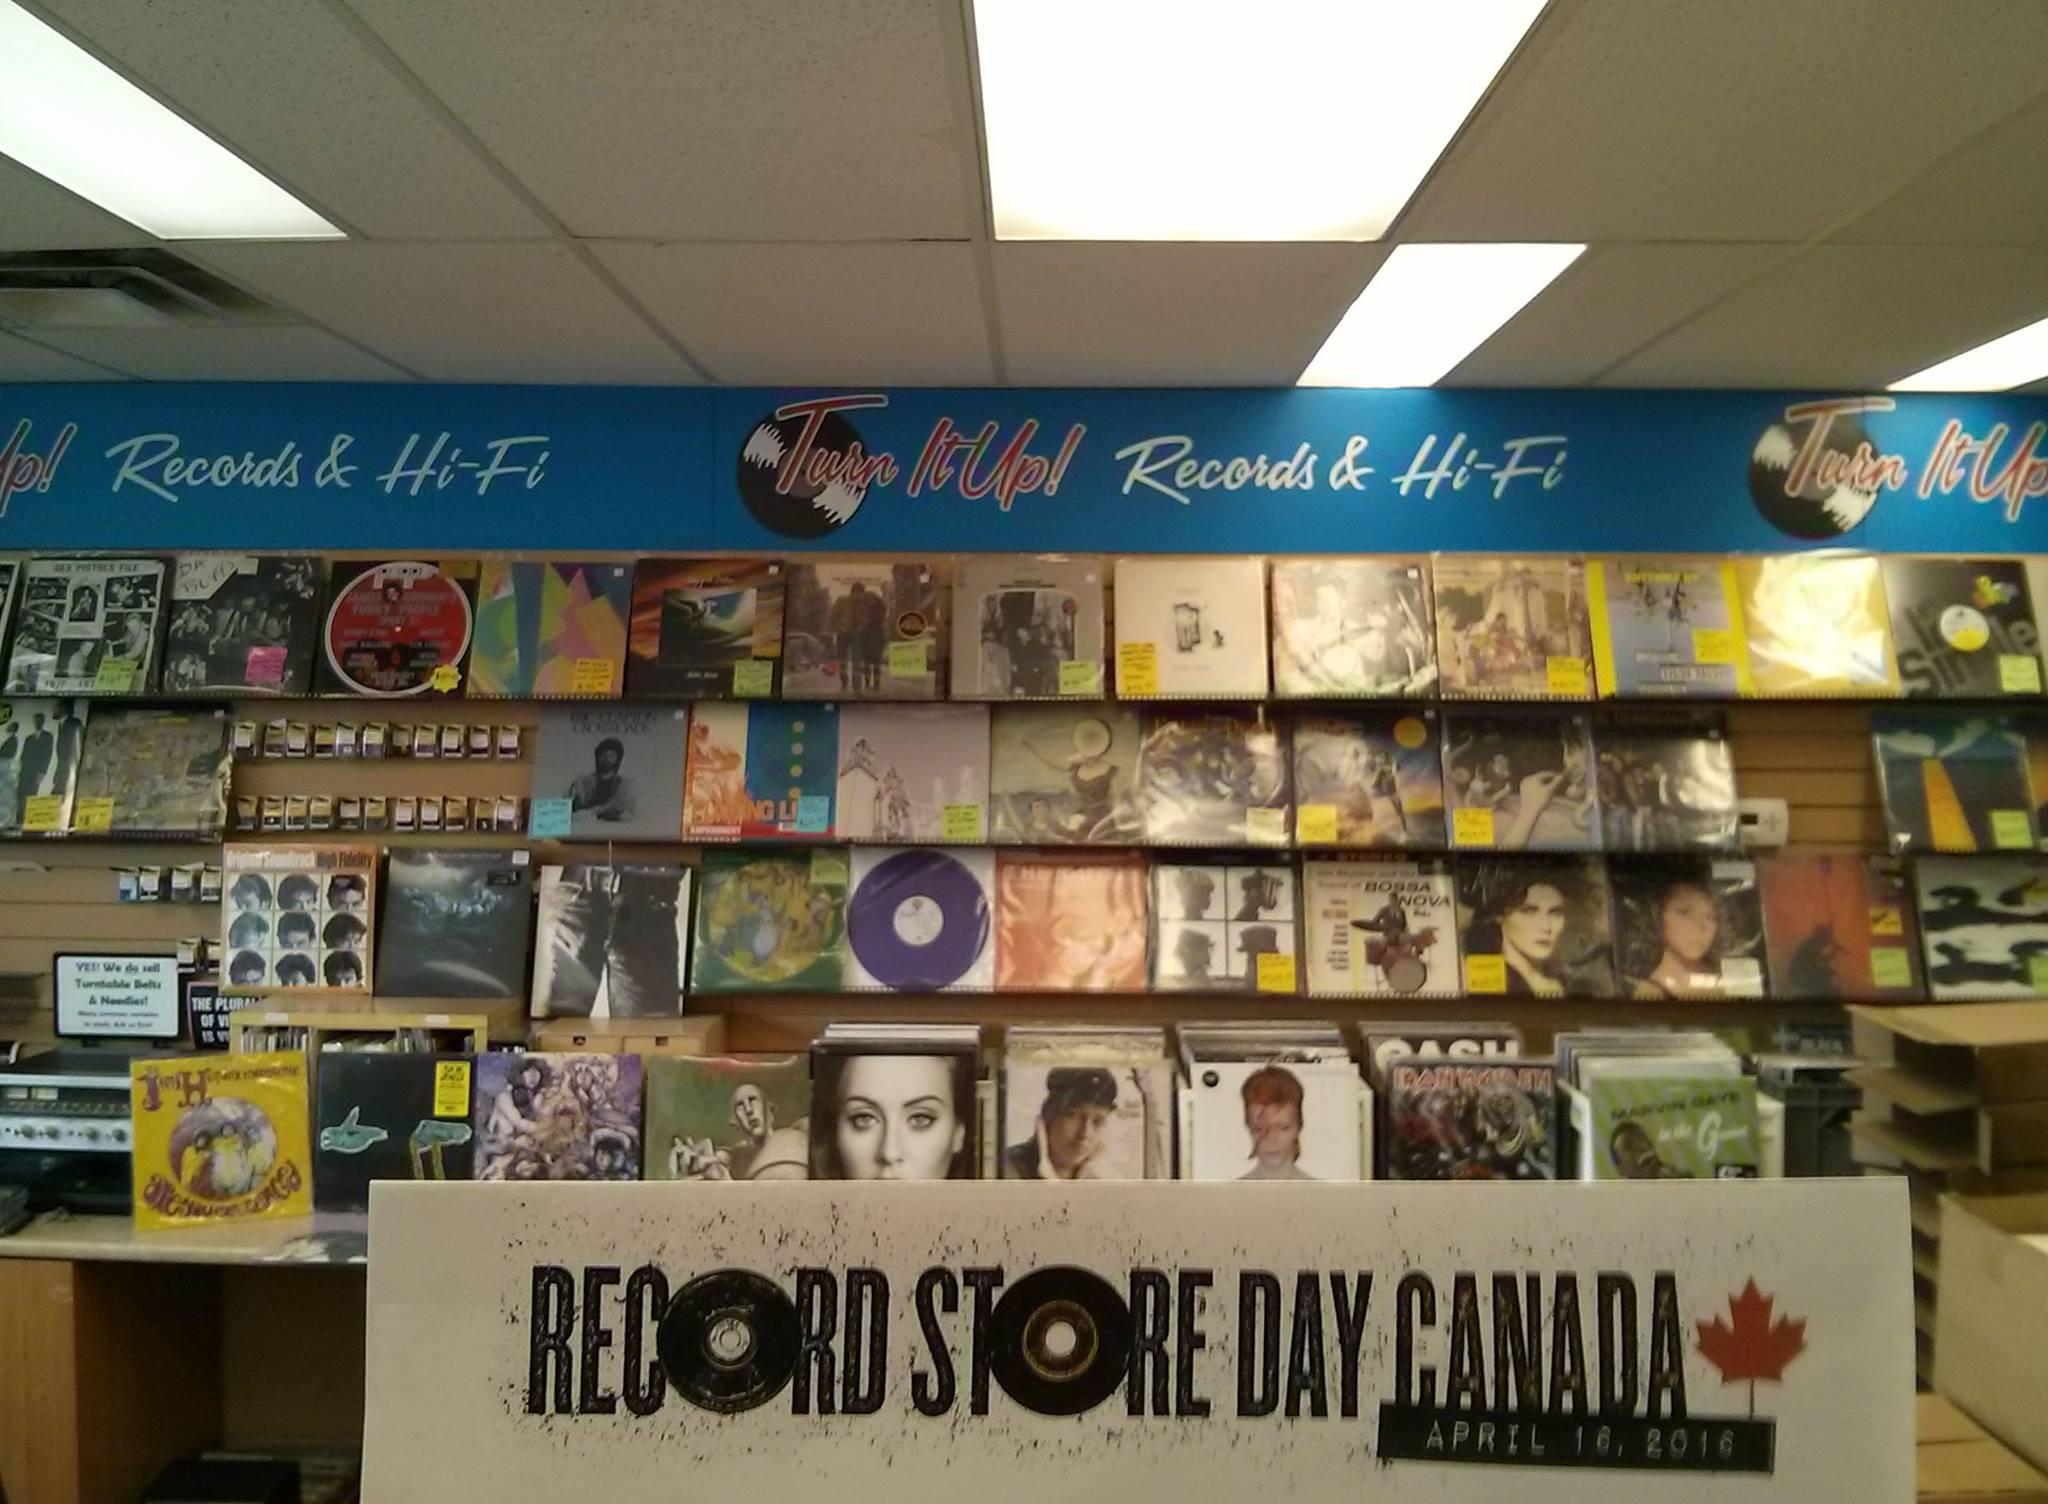 Image: Turn It Up! Records & Hifi